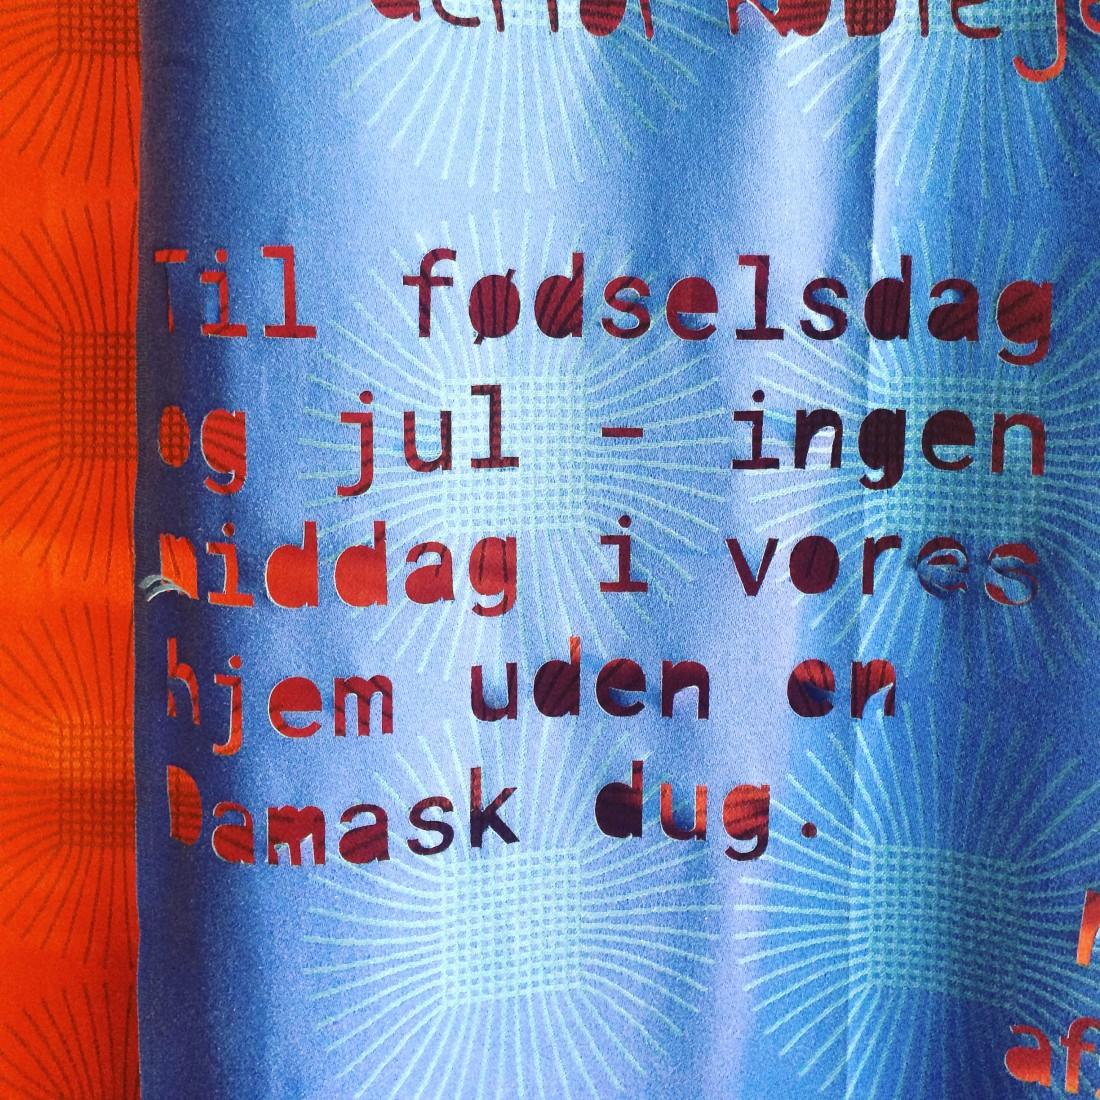 damask_dug_georg_jensen_rudolph_kunst_6